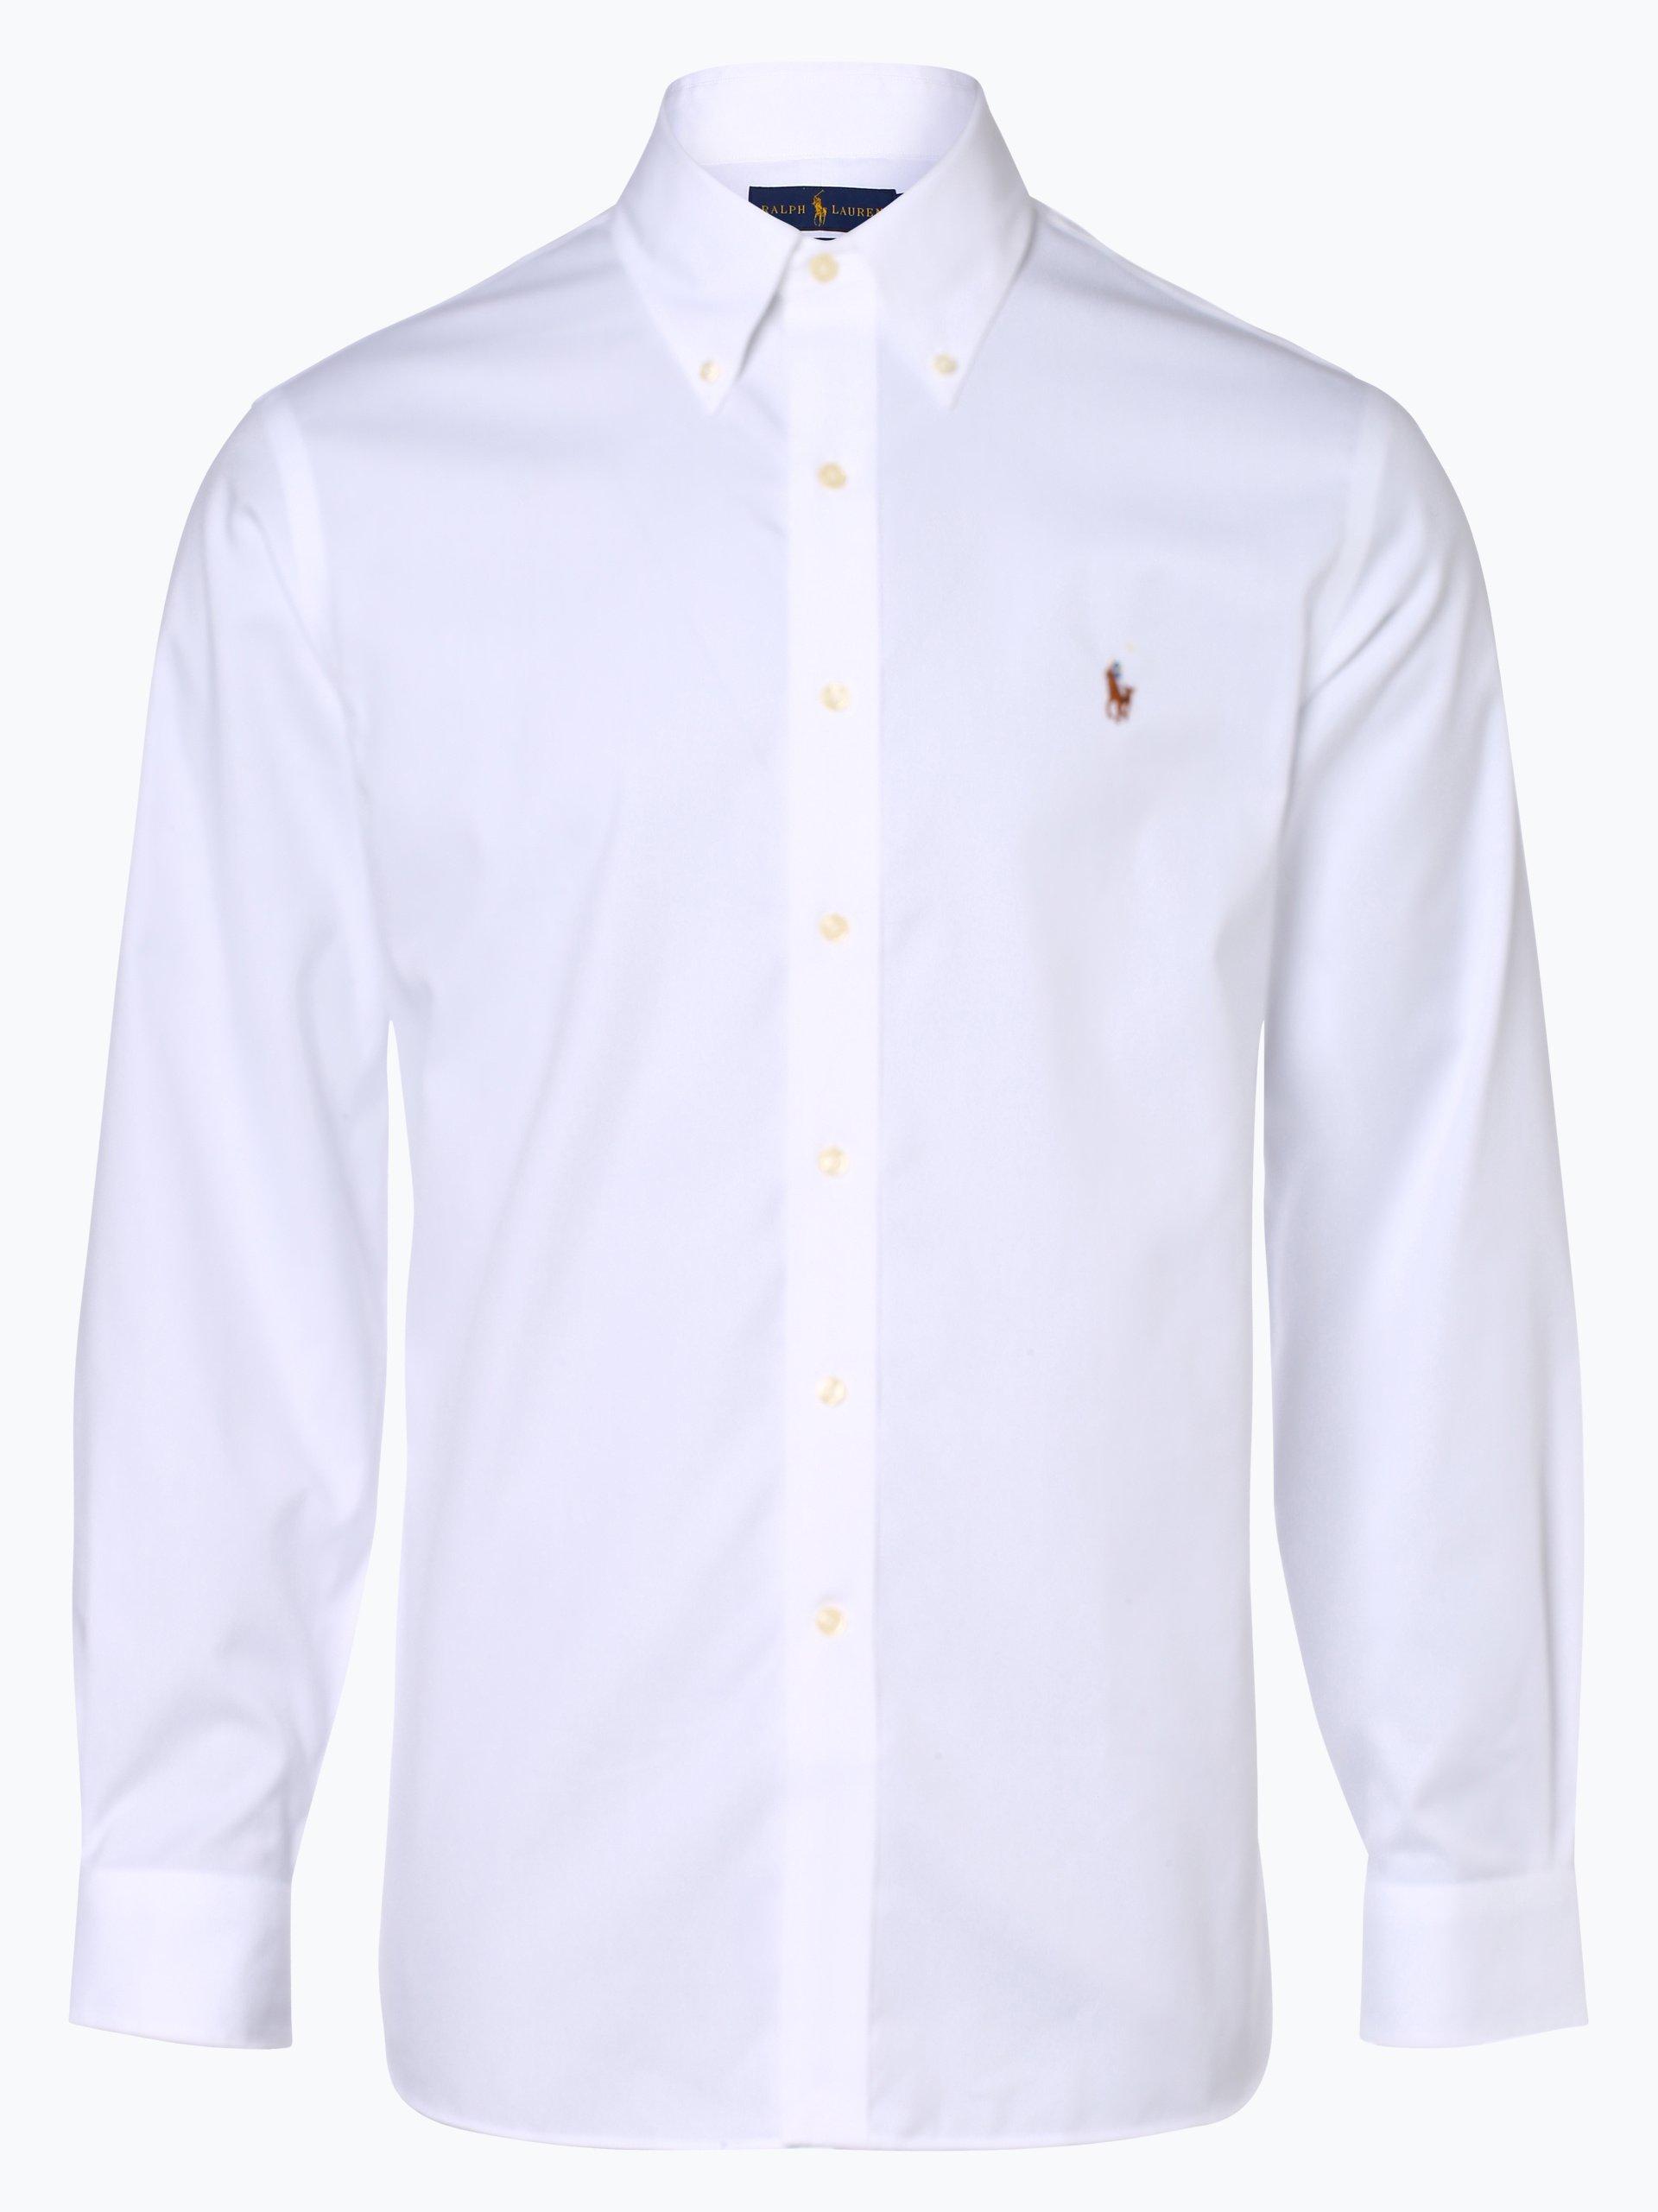 Polo Ralph Lauren Herren Hemd Bügelleicht